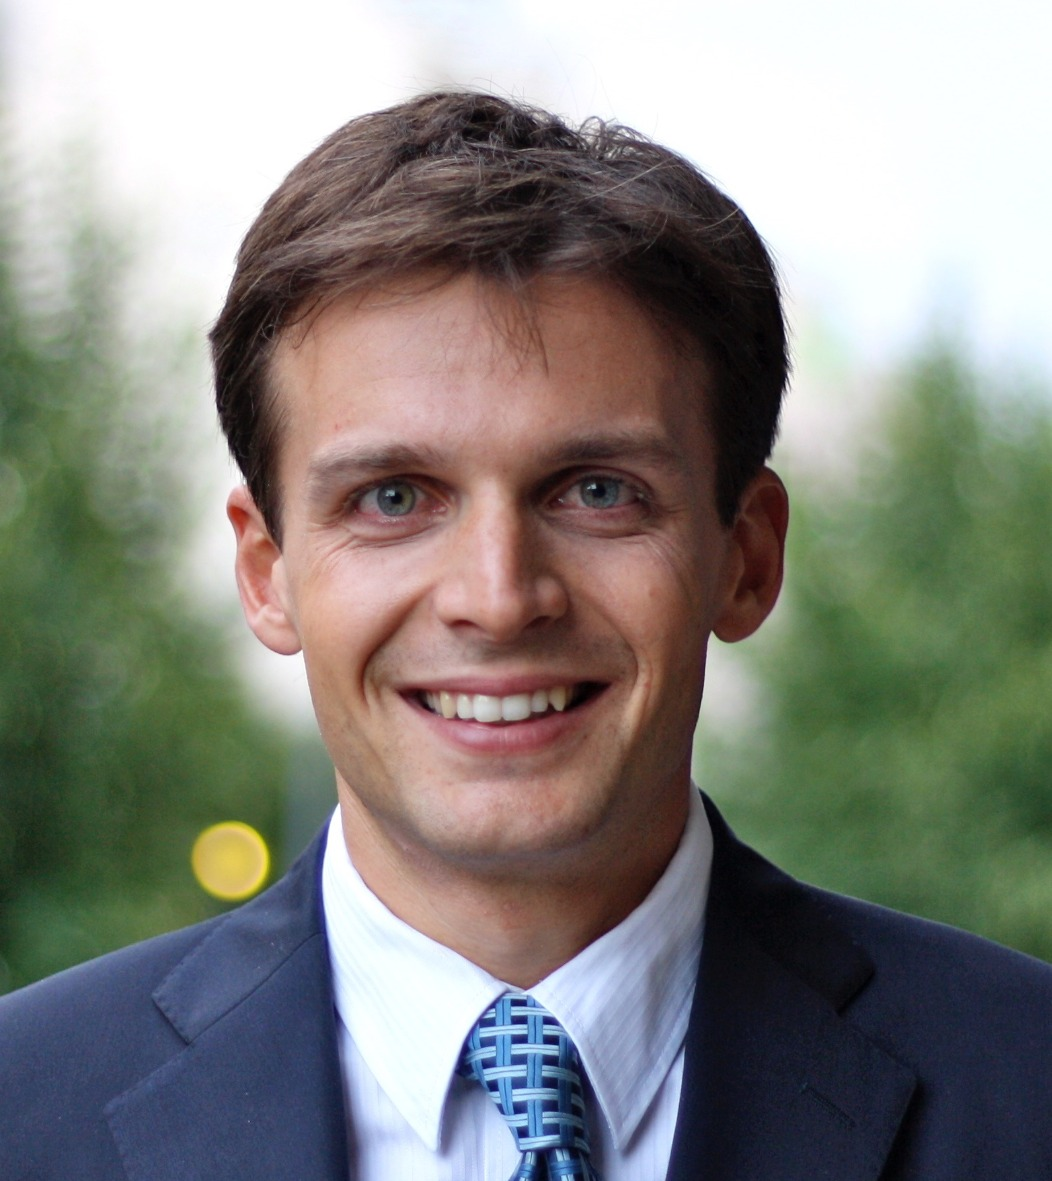 Matteo Bernardoni